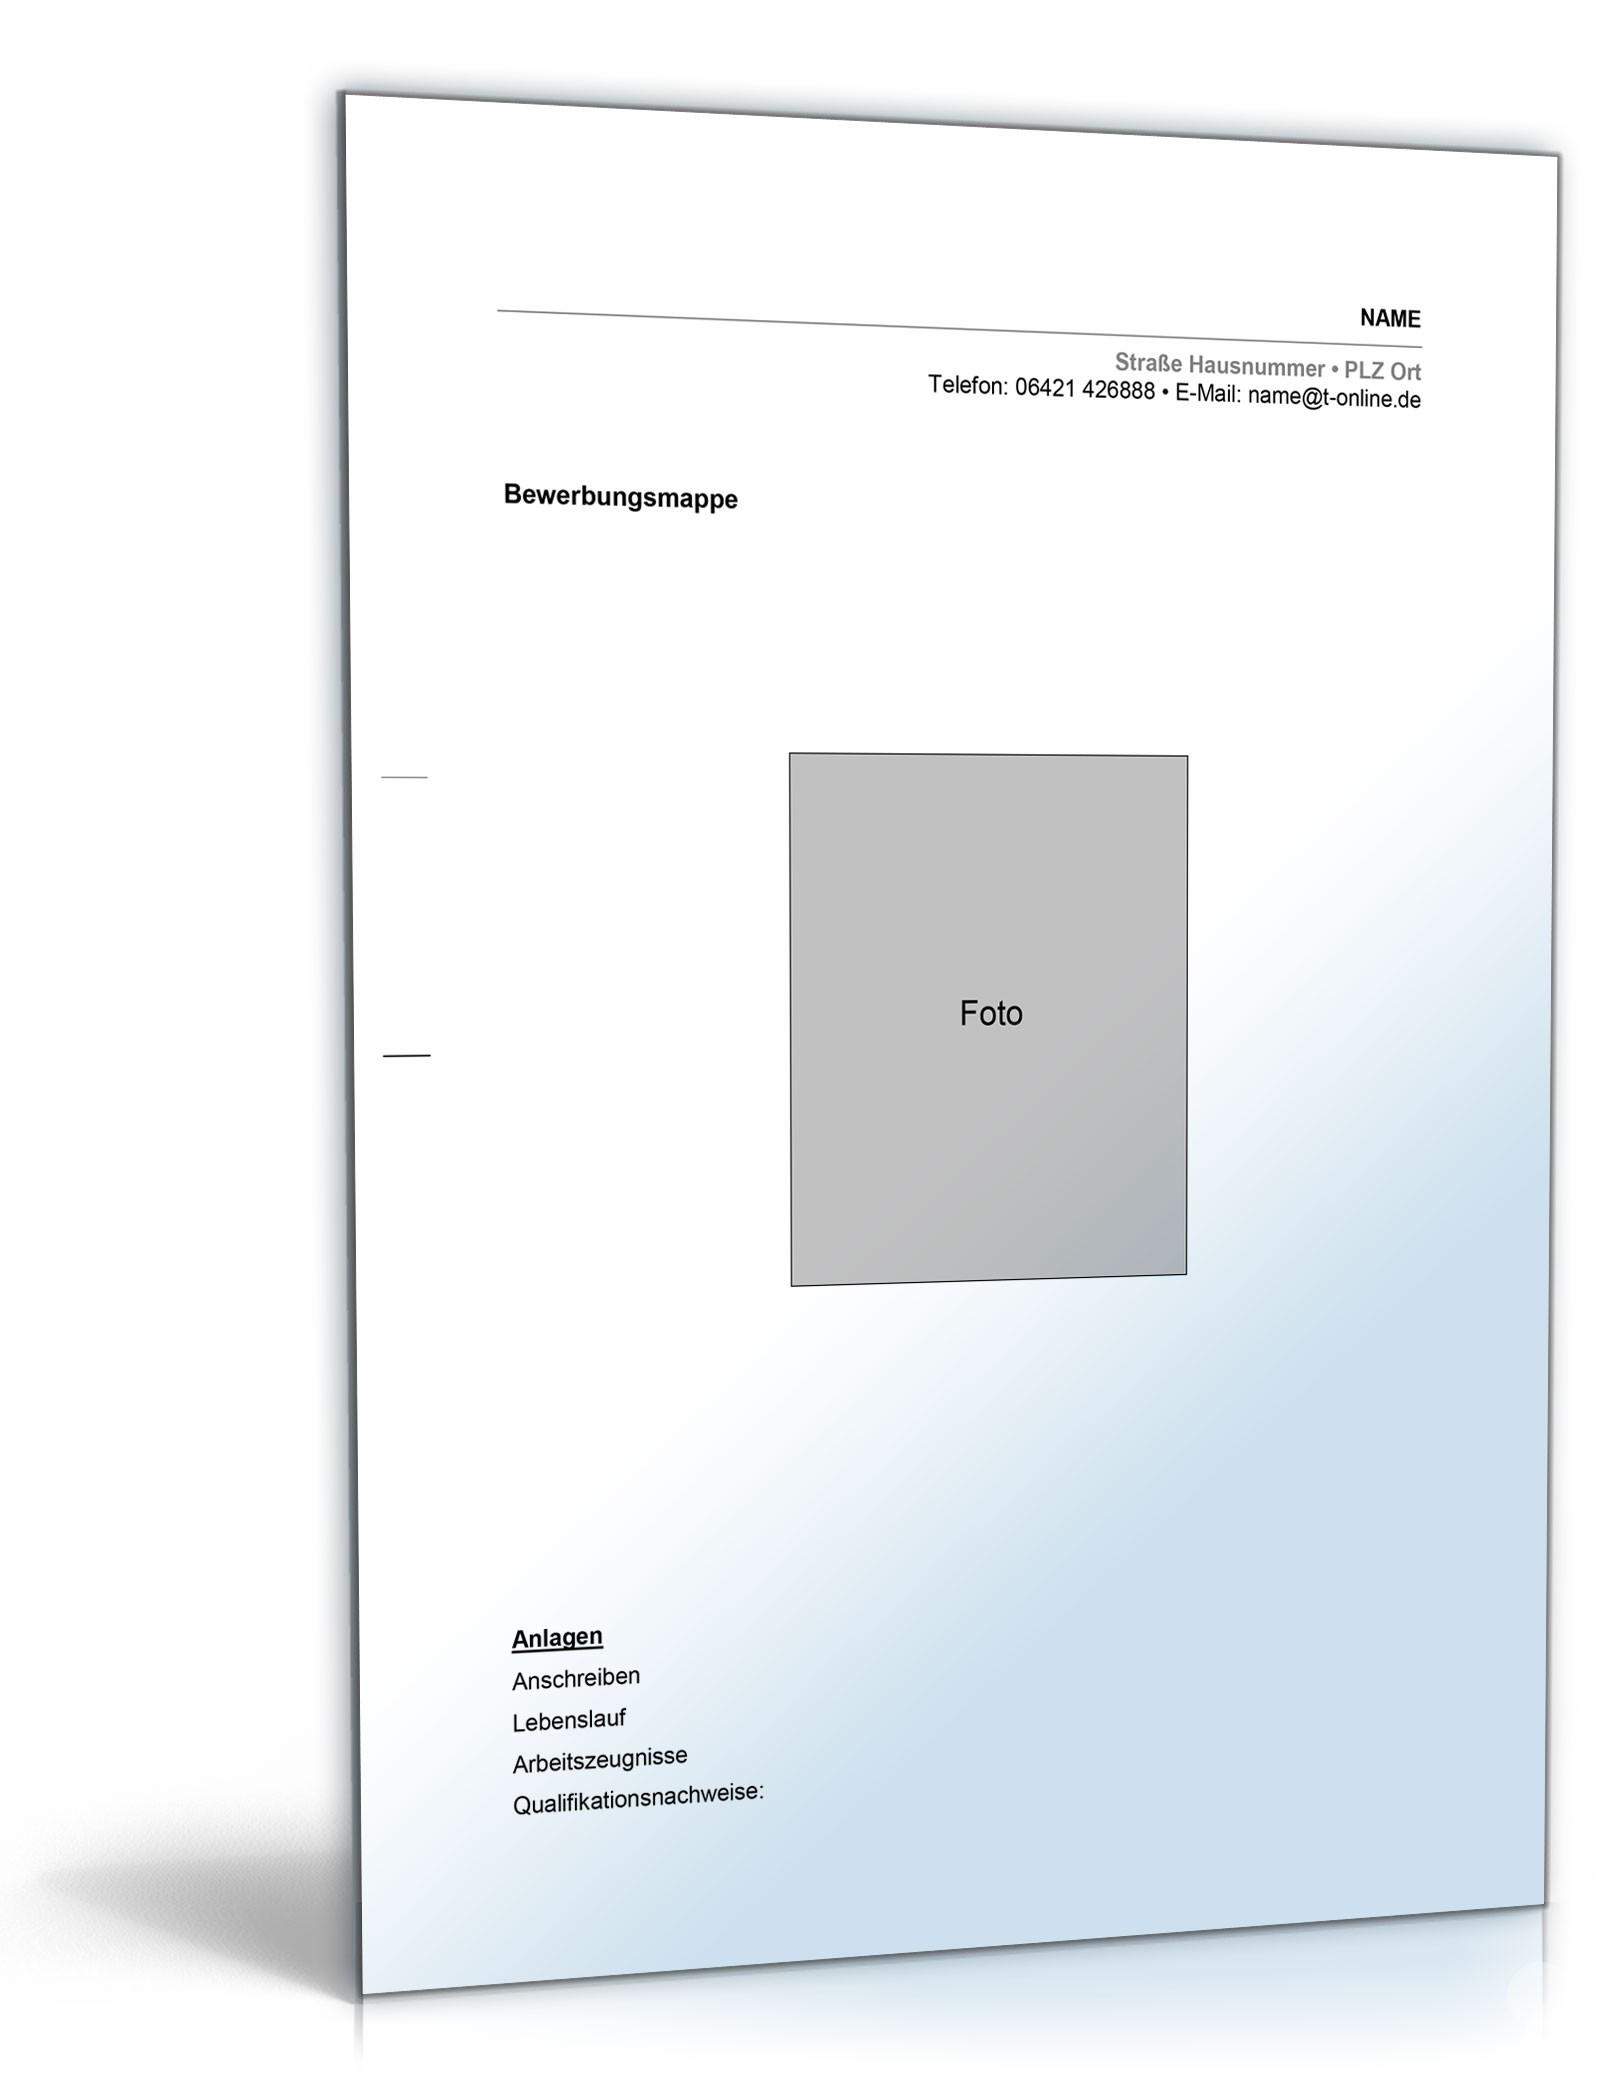 Bewerbung Kfz Mechatroniker kostenloses Muster zum Download